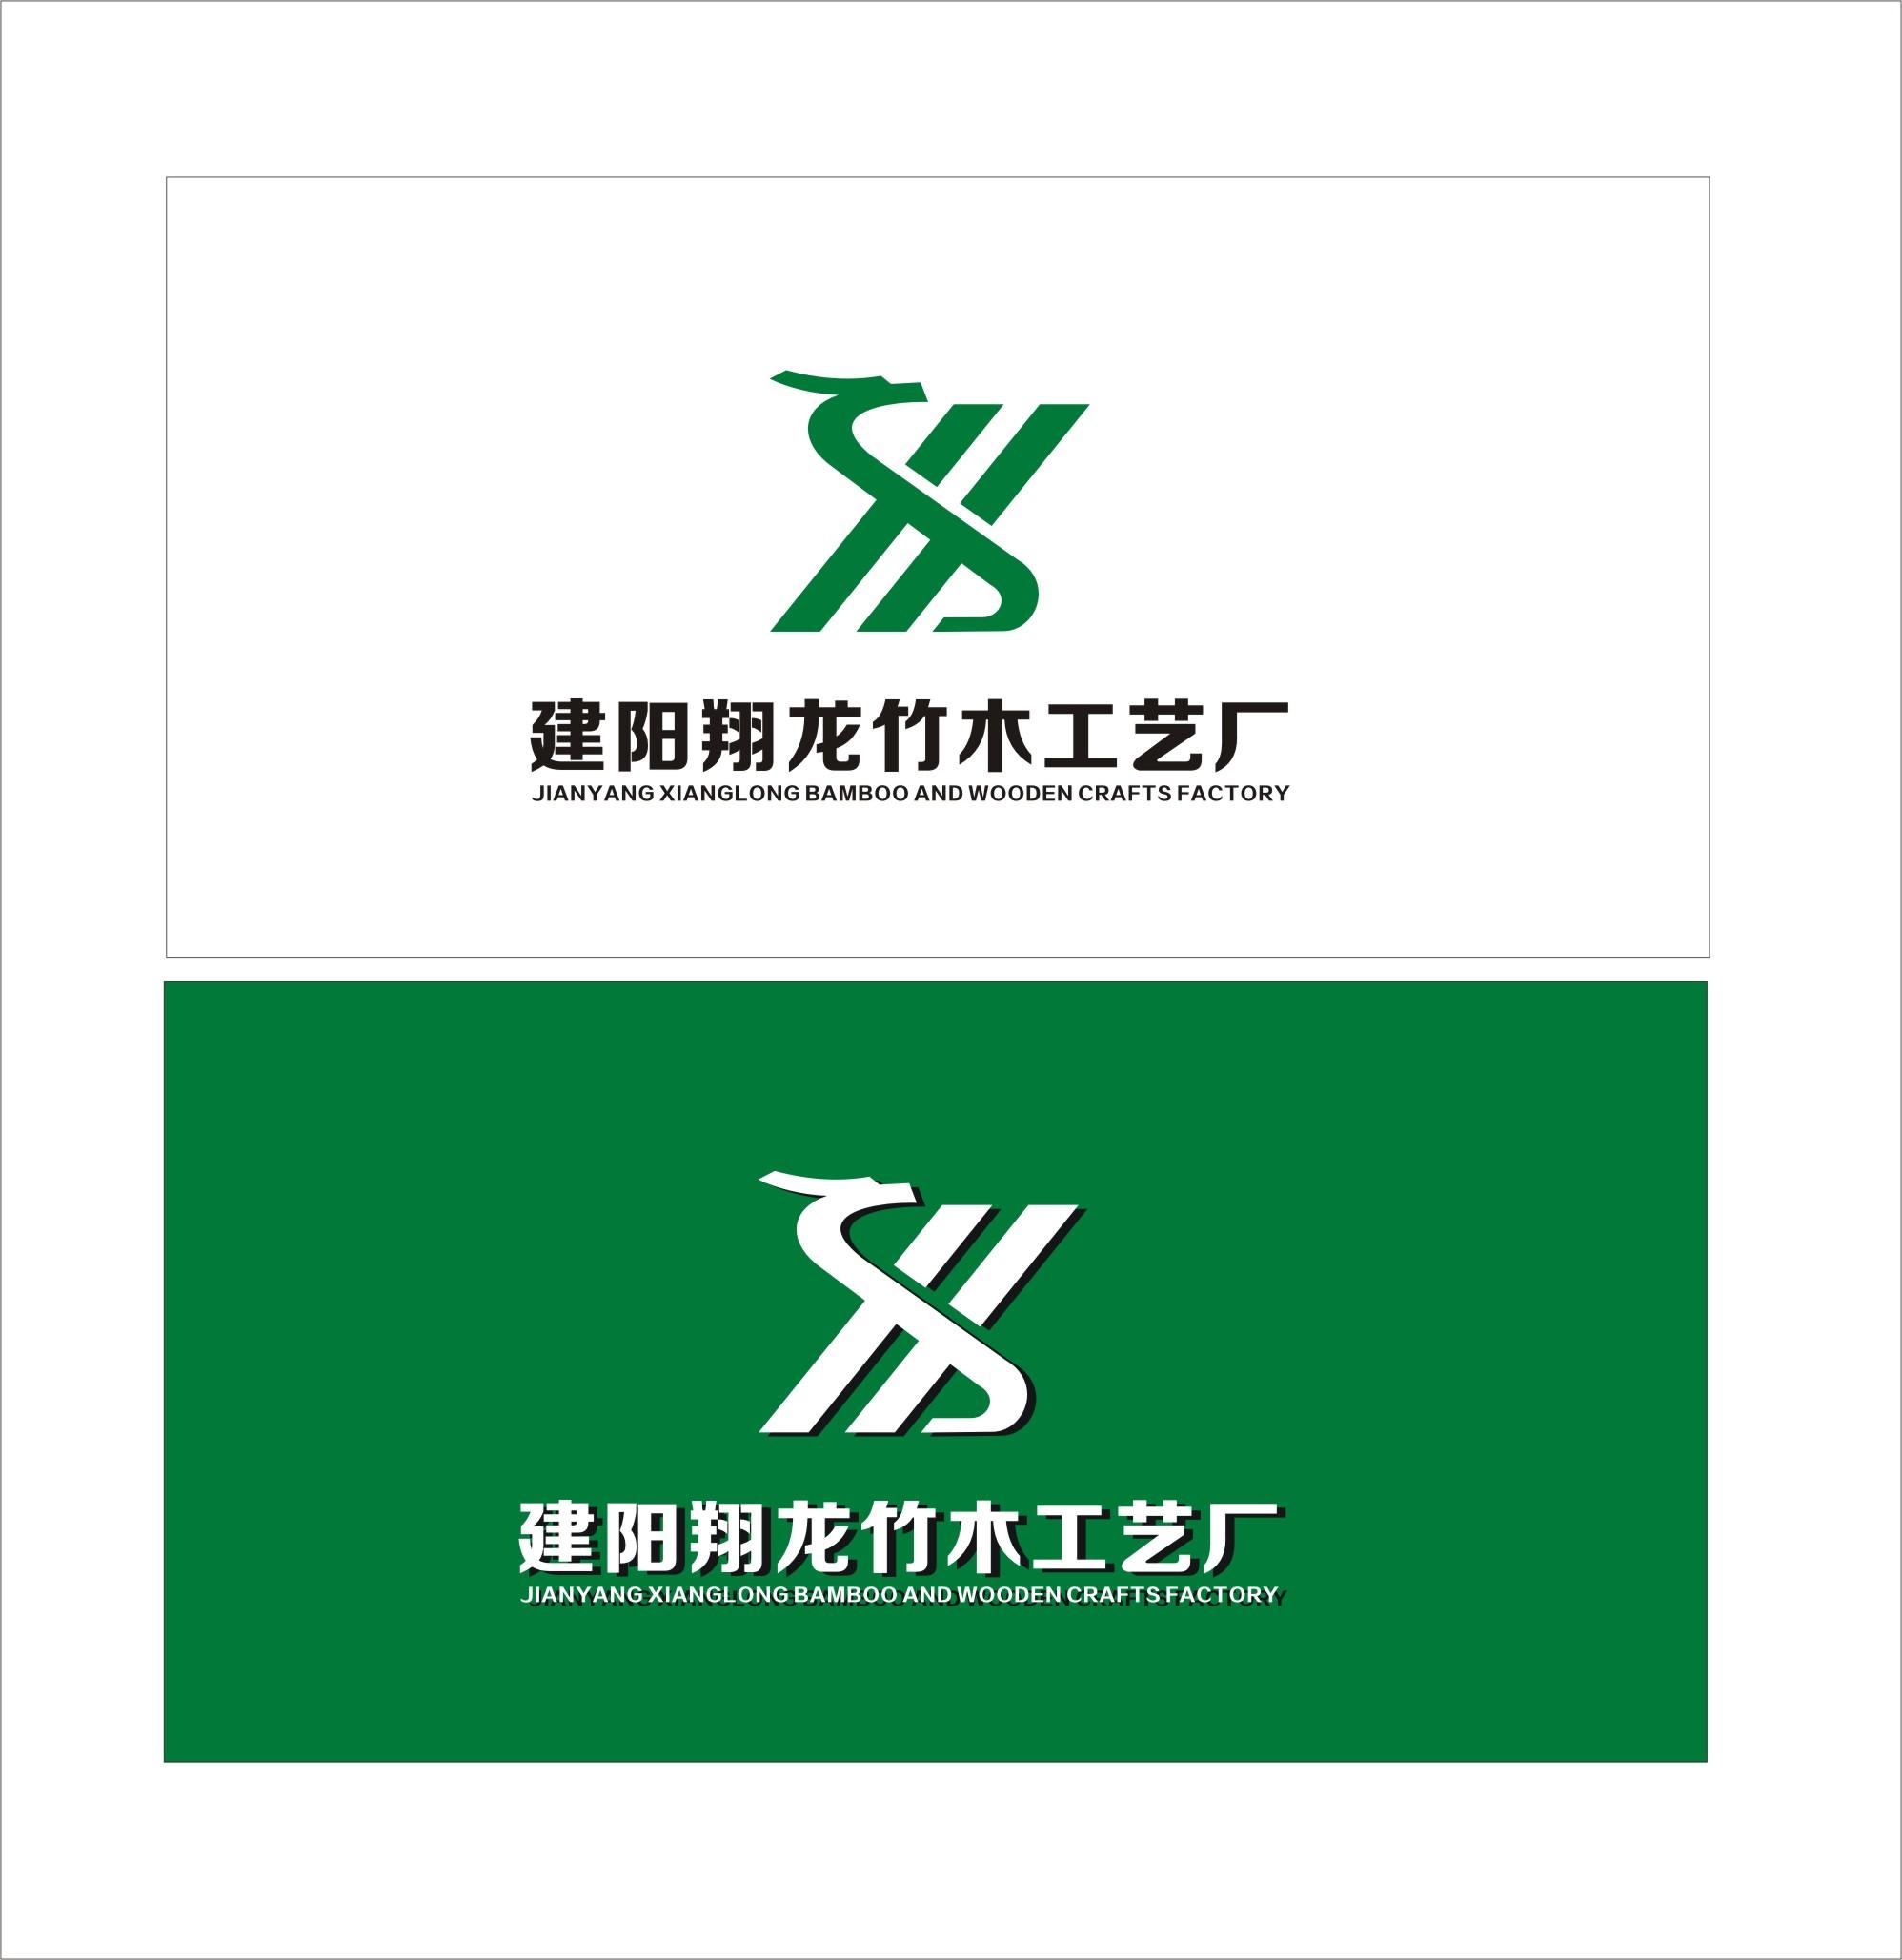 lx服装logo设计 lx服装logo设计分享展示